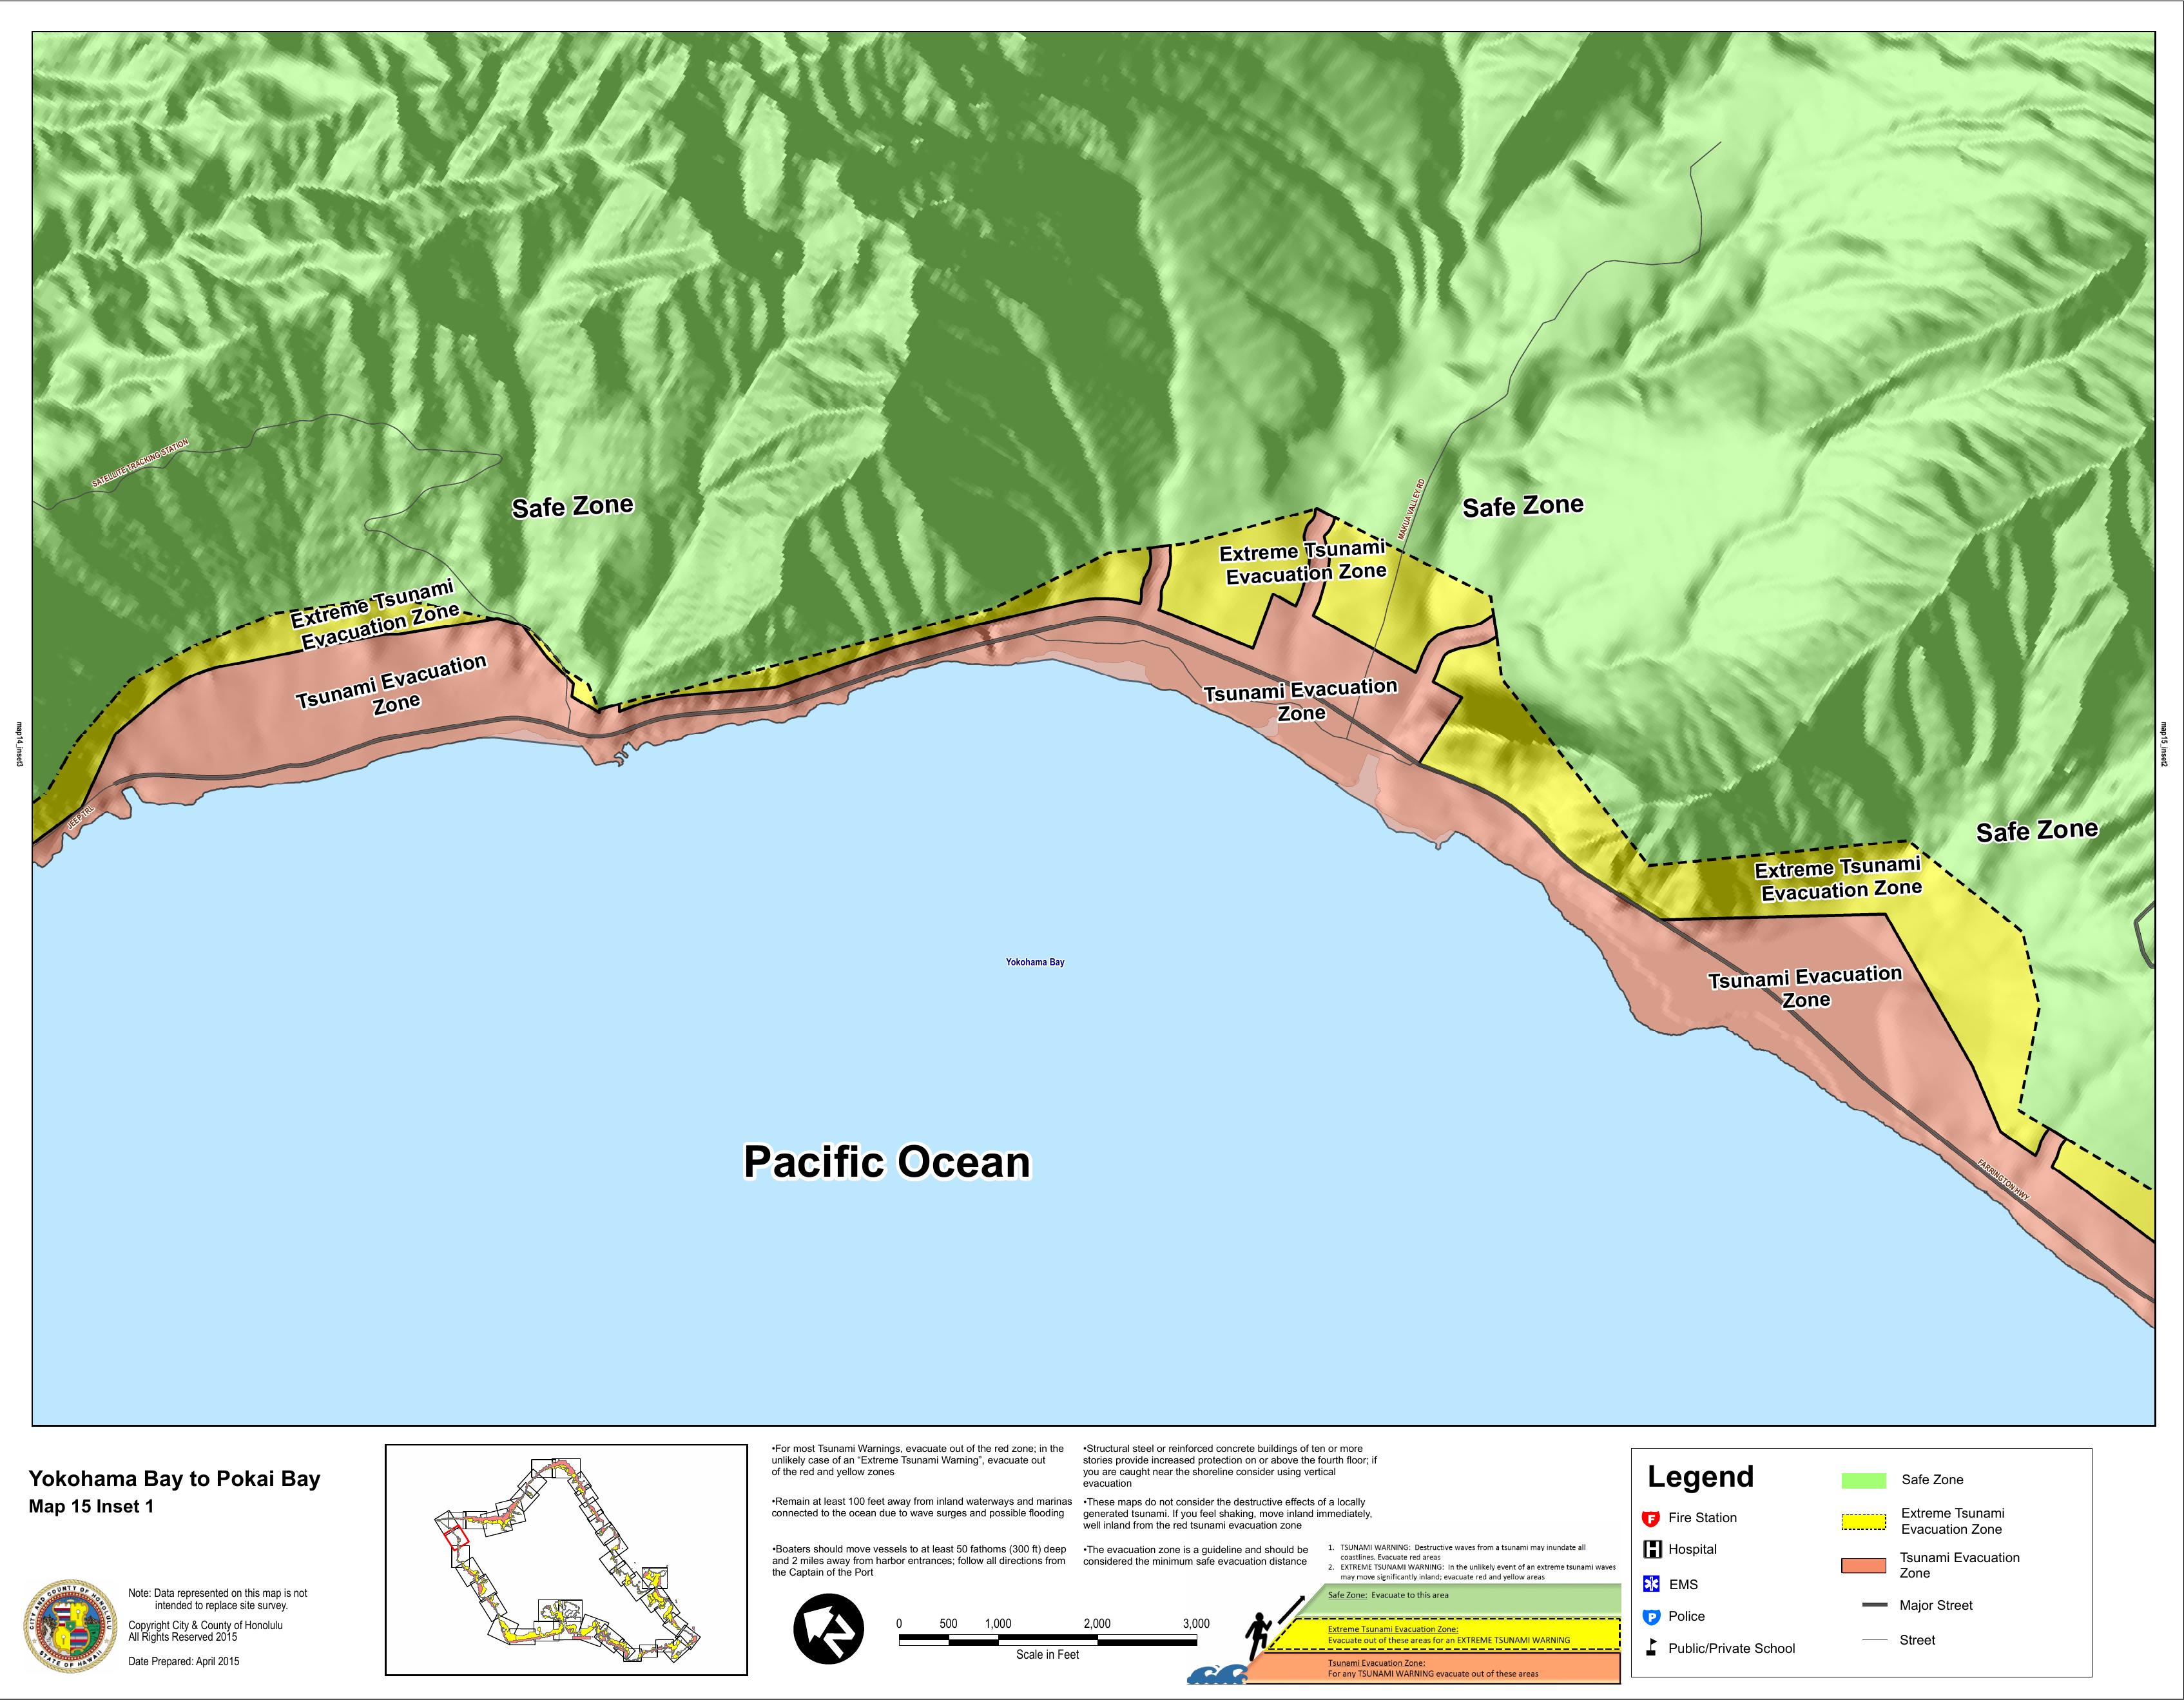 Hawaii State Tsunami Evacuation Maps on honolulu neighborhood map, honolulu county map, pahoa map, kapaa map, kaha lani map, laie map, hawaiian paradise park map, north kohala map, lanikai map, waianae map, kahala map, sunset map, waipahu map, makawao map, mililani map, honolulu bus route map, hawaiian beaches map, pauoa valley map, punaluu map, aina haina map,